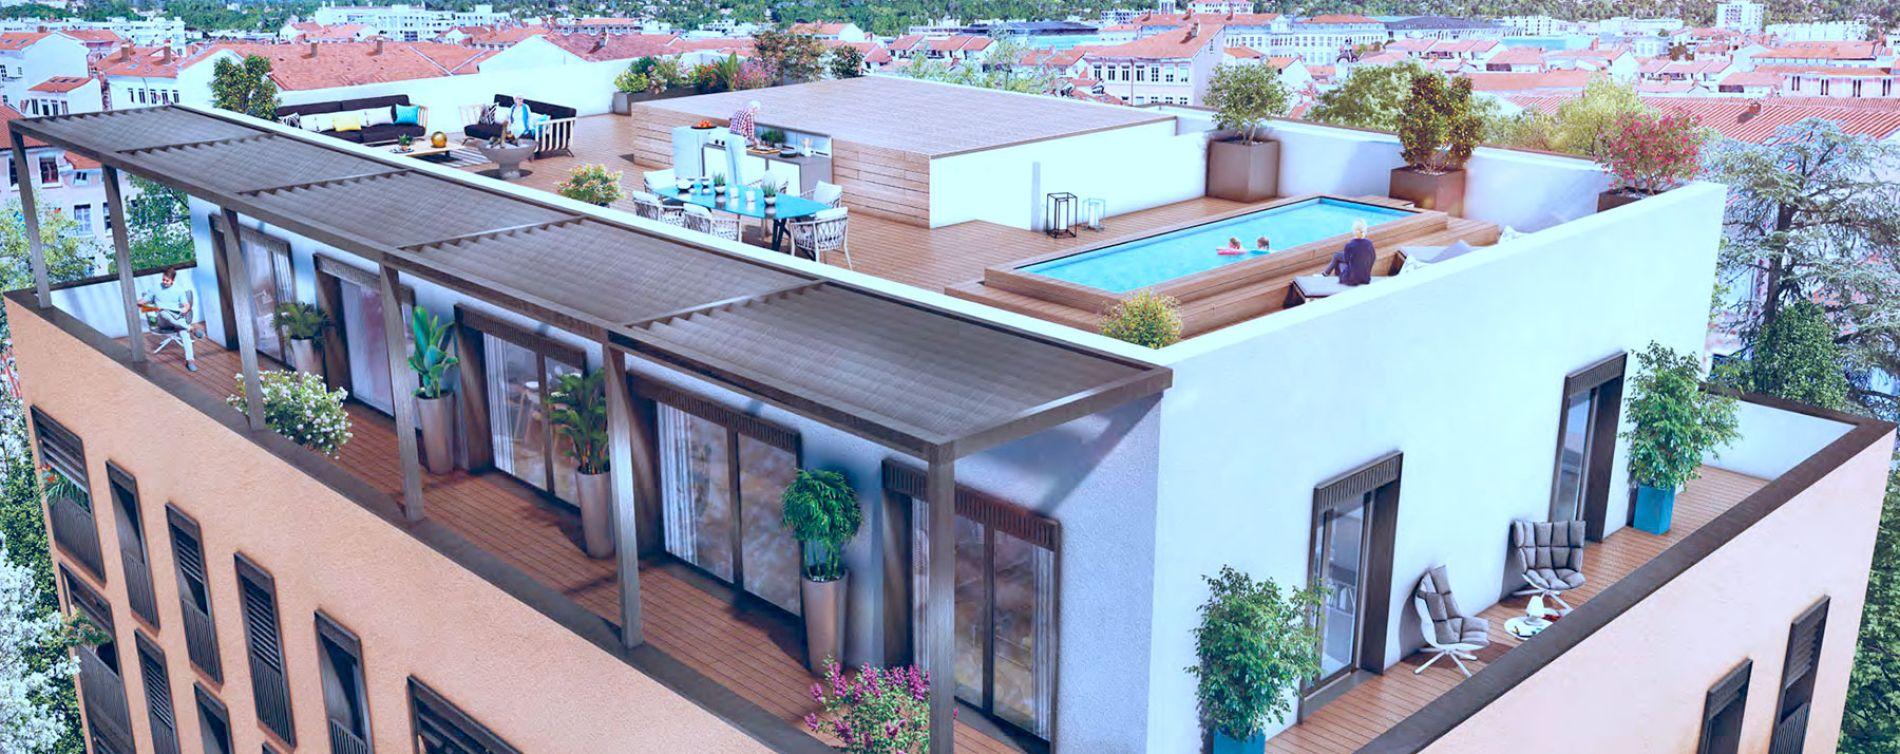 Lyon : programme immobilier neuve « Programme immobilier n°216405 » (3)